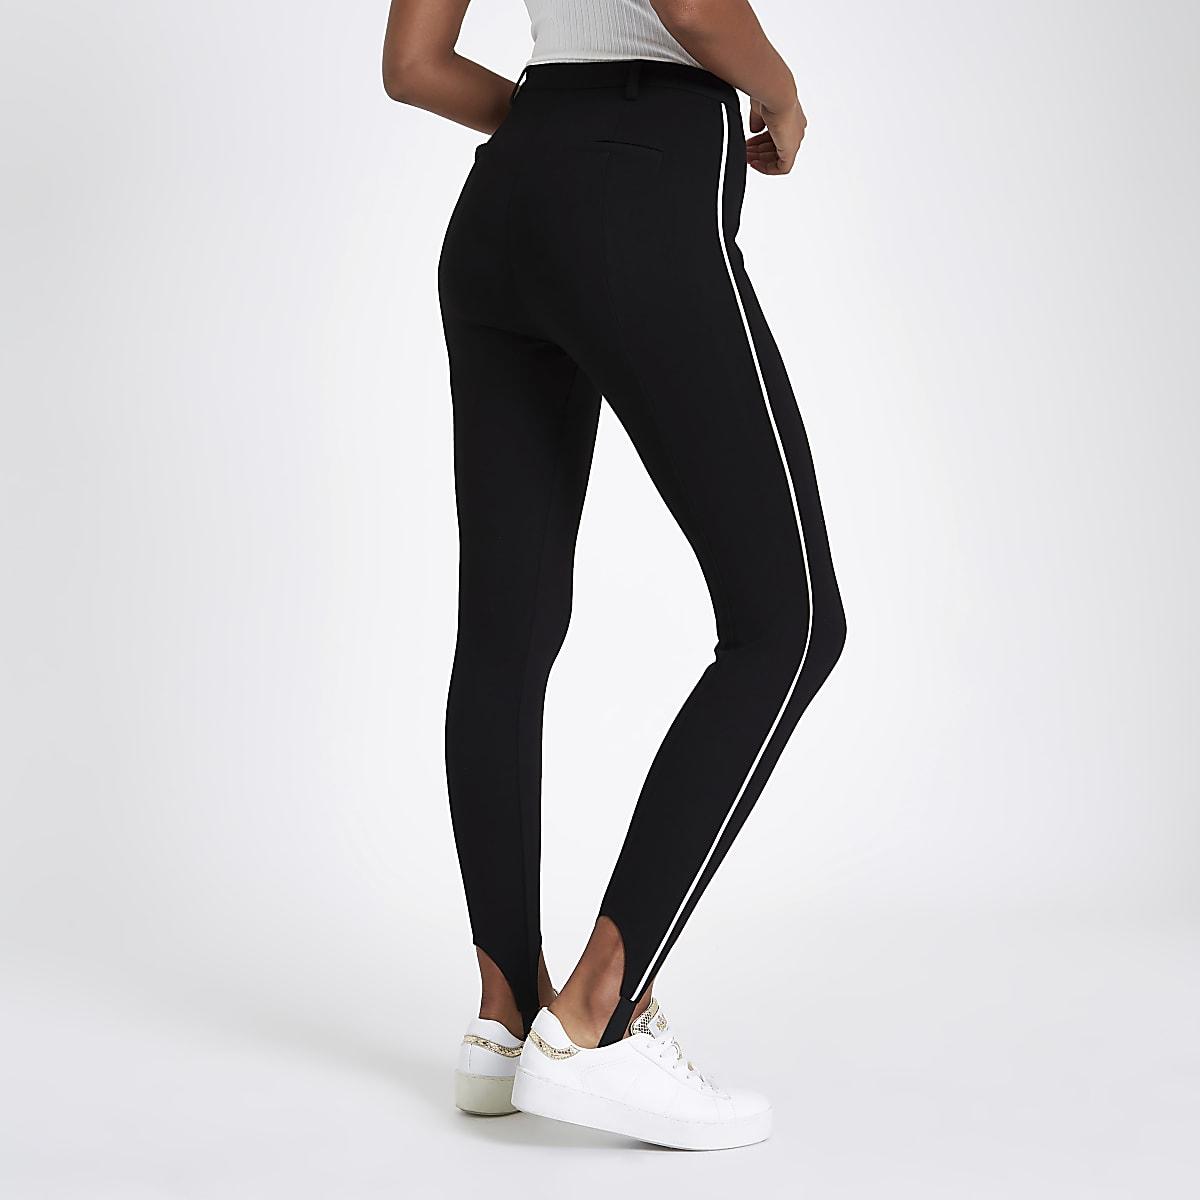 0e459ddcfb78 Black stripe side stirrup leggings - Skinny Trousers - Trousers - women